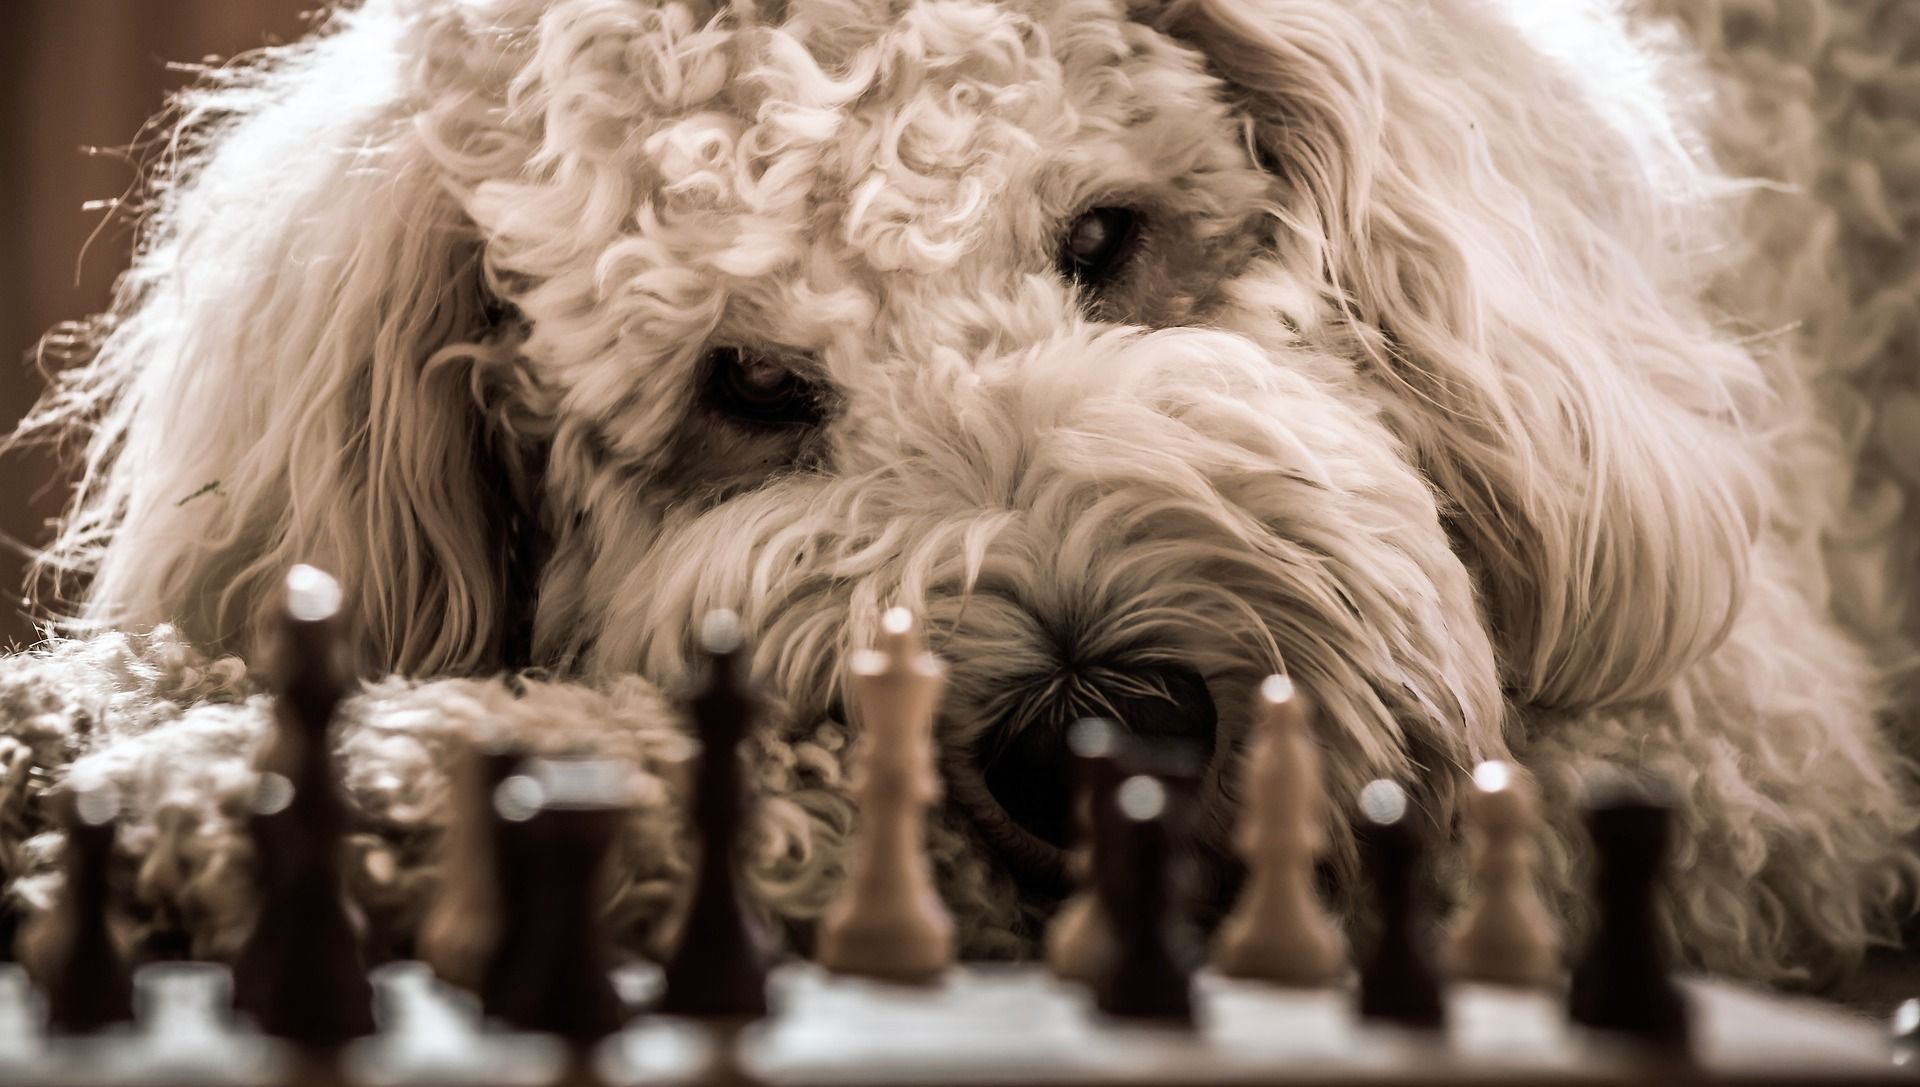 SNOPUS® News | SNOPUS® - Hunde fürs Leben